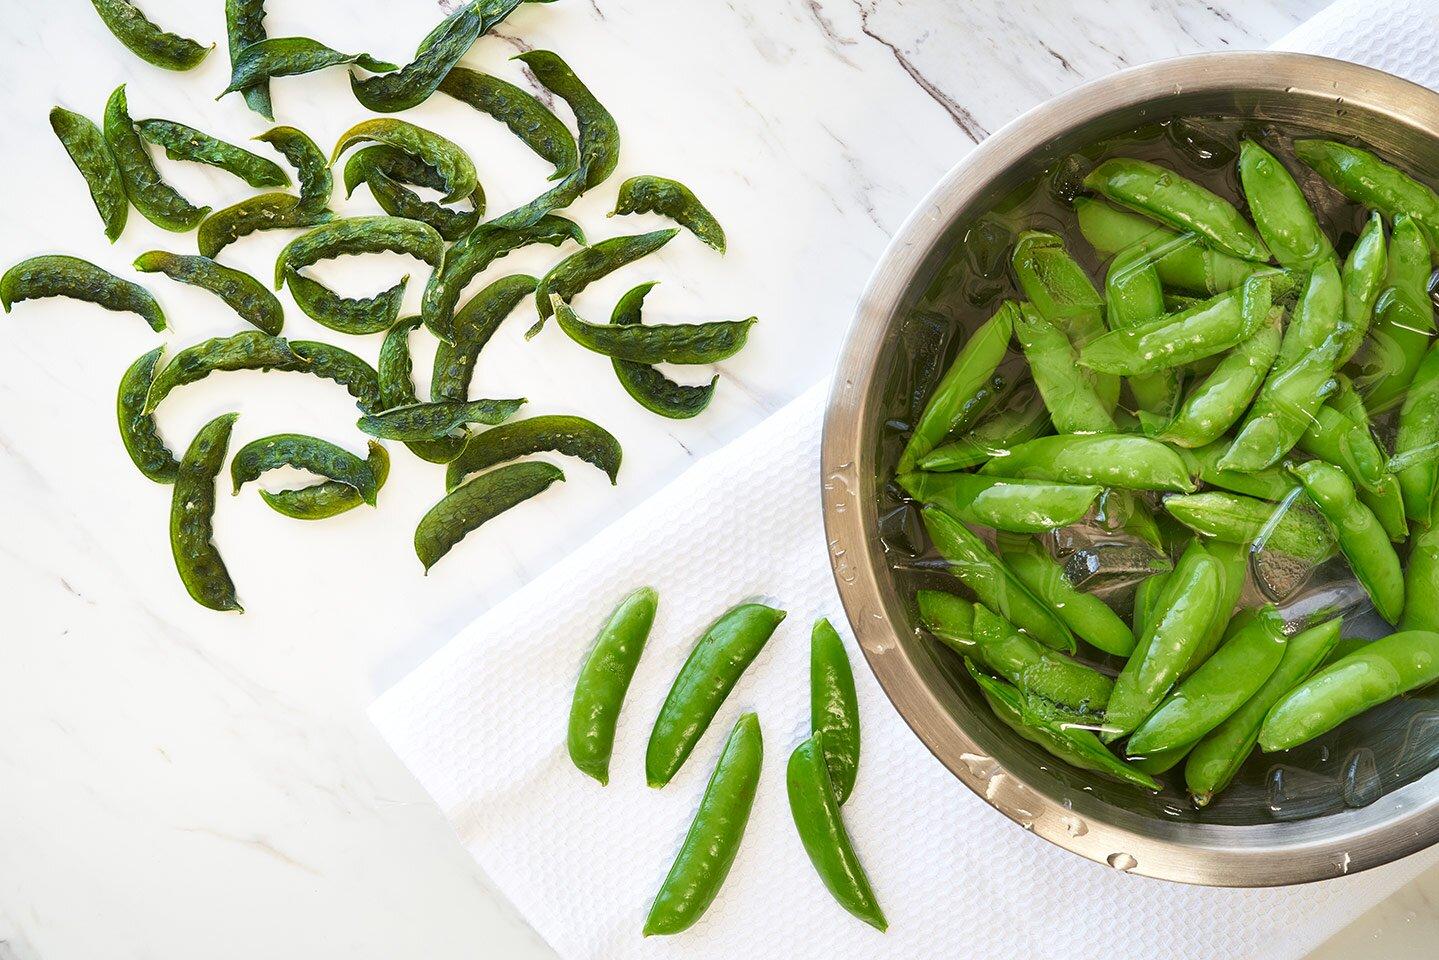 dried sugar snap peas